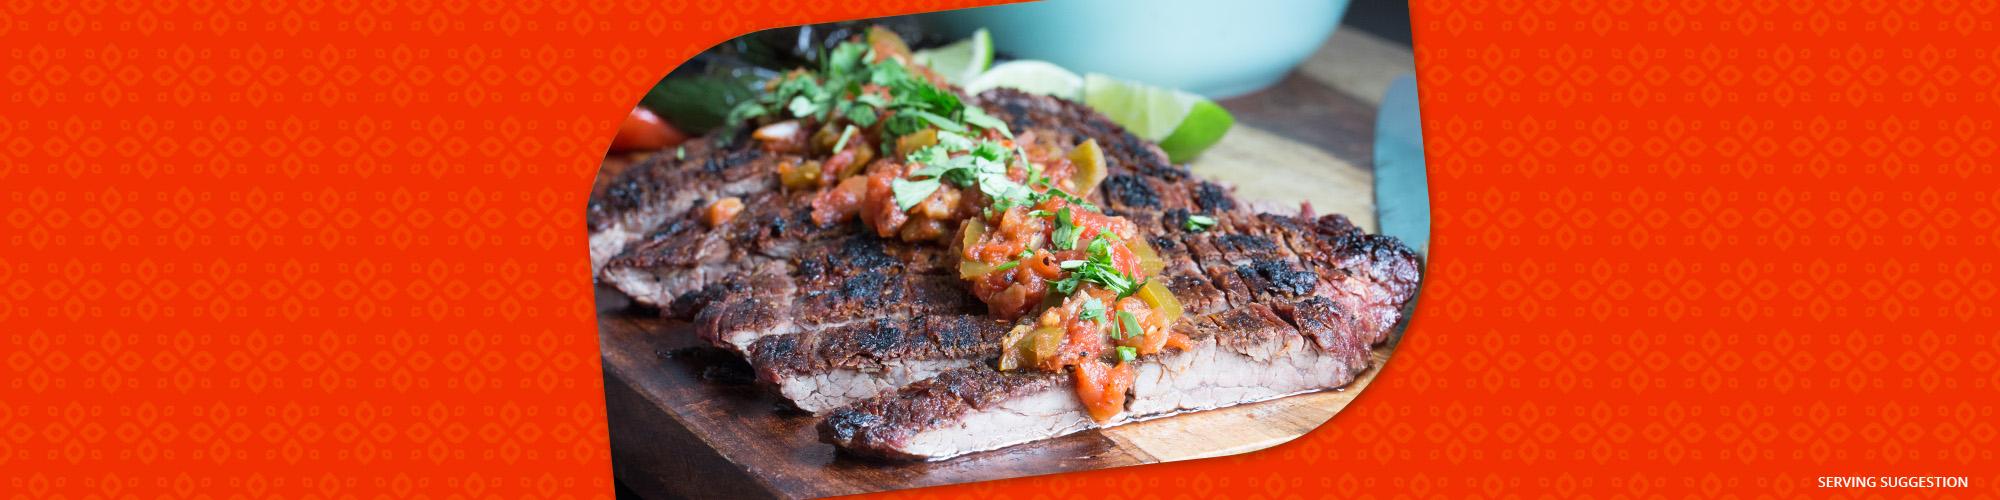 Salsas carne asada tacos